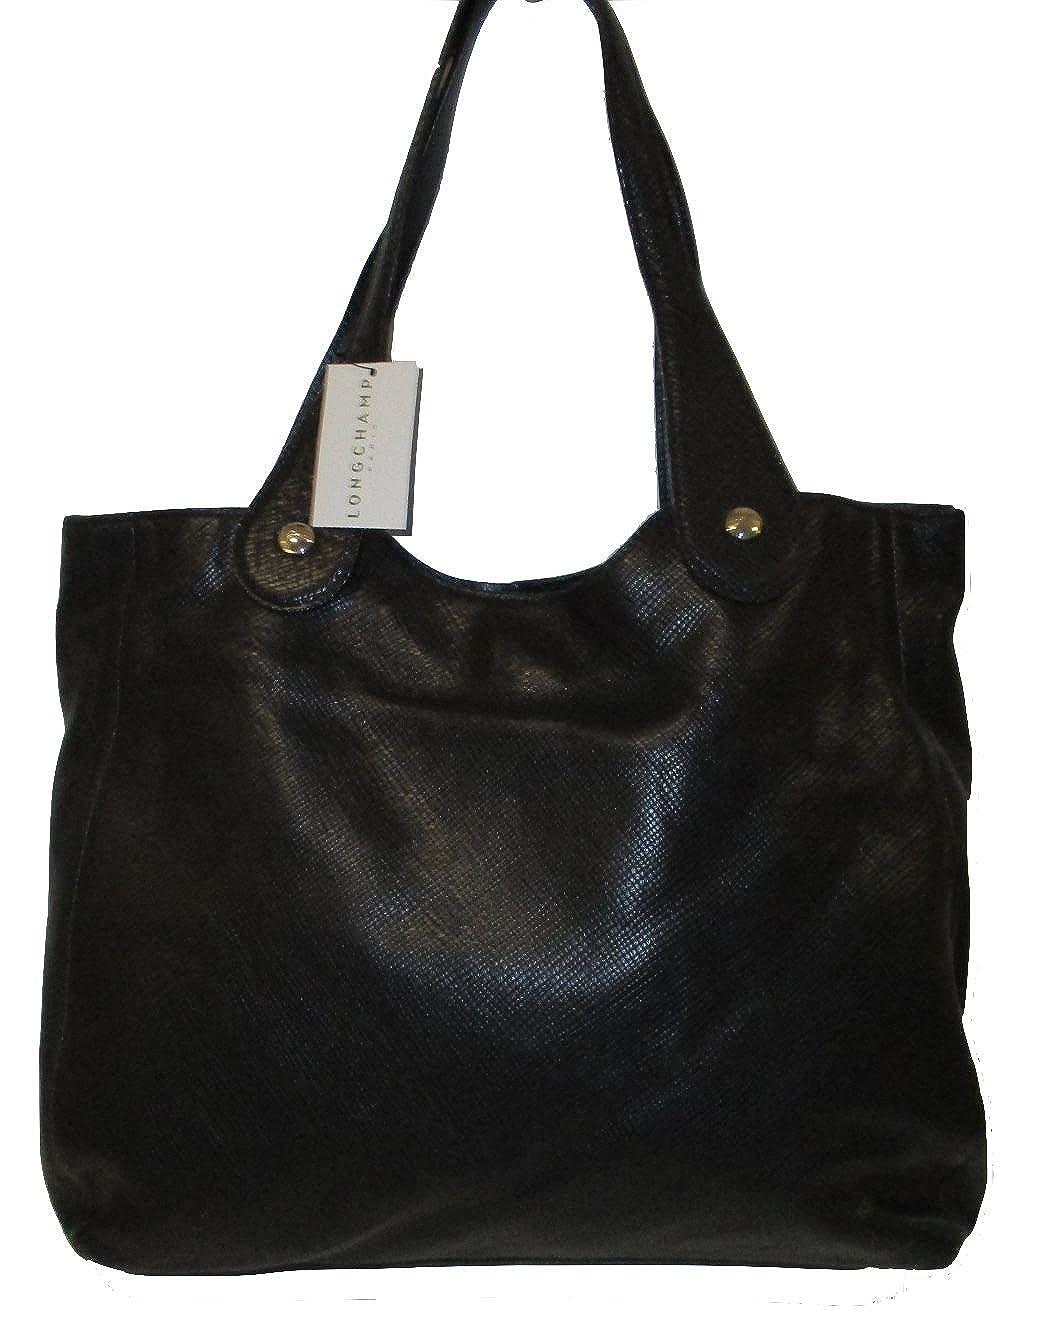 Longchamp Quadri 1085786001 Black Leather Shoulder Bag Made In Quadry France Shoes Handbags